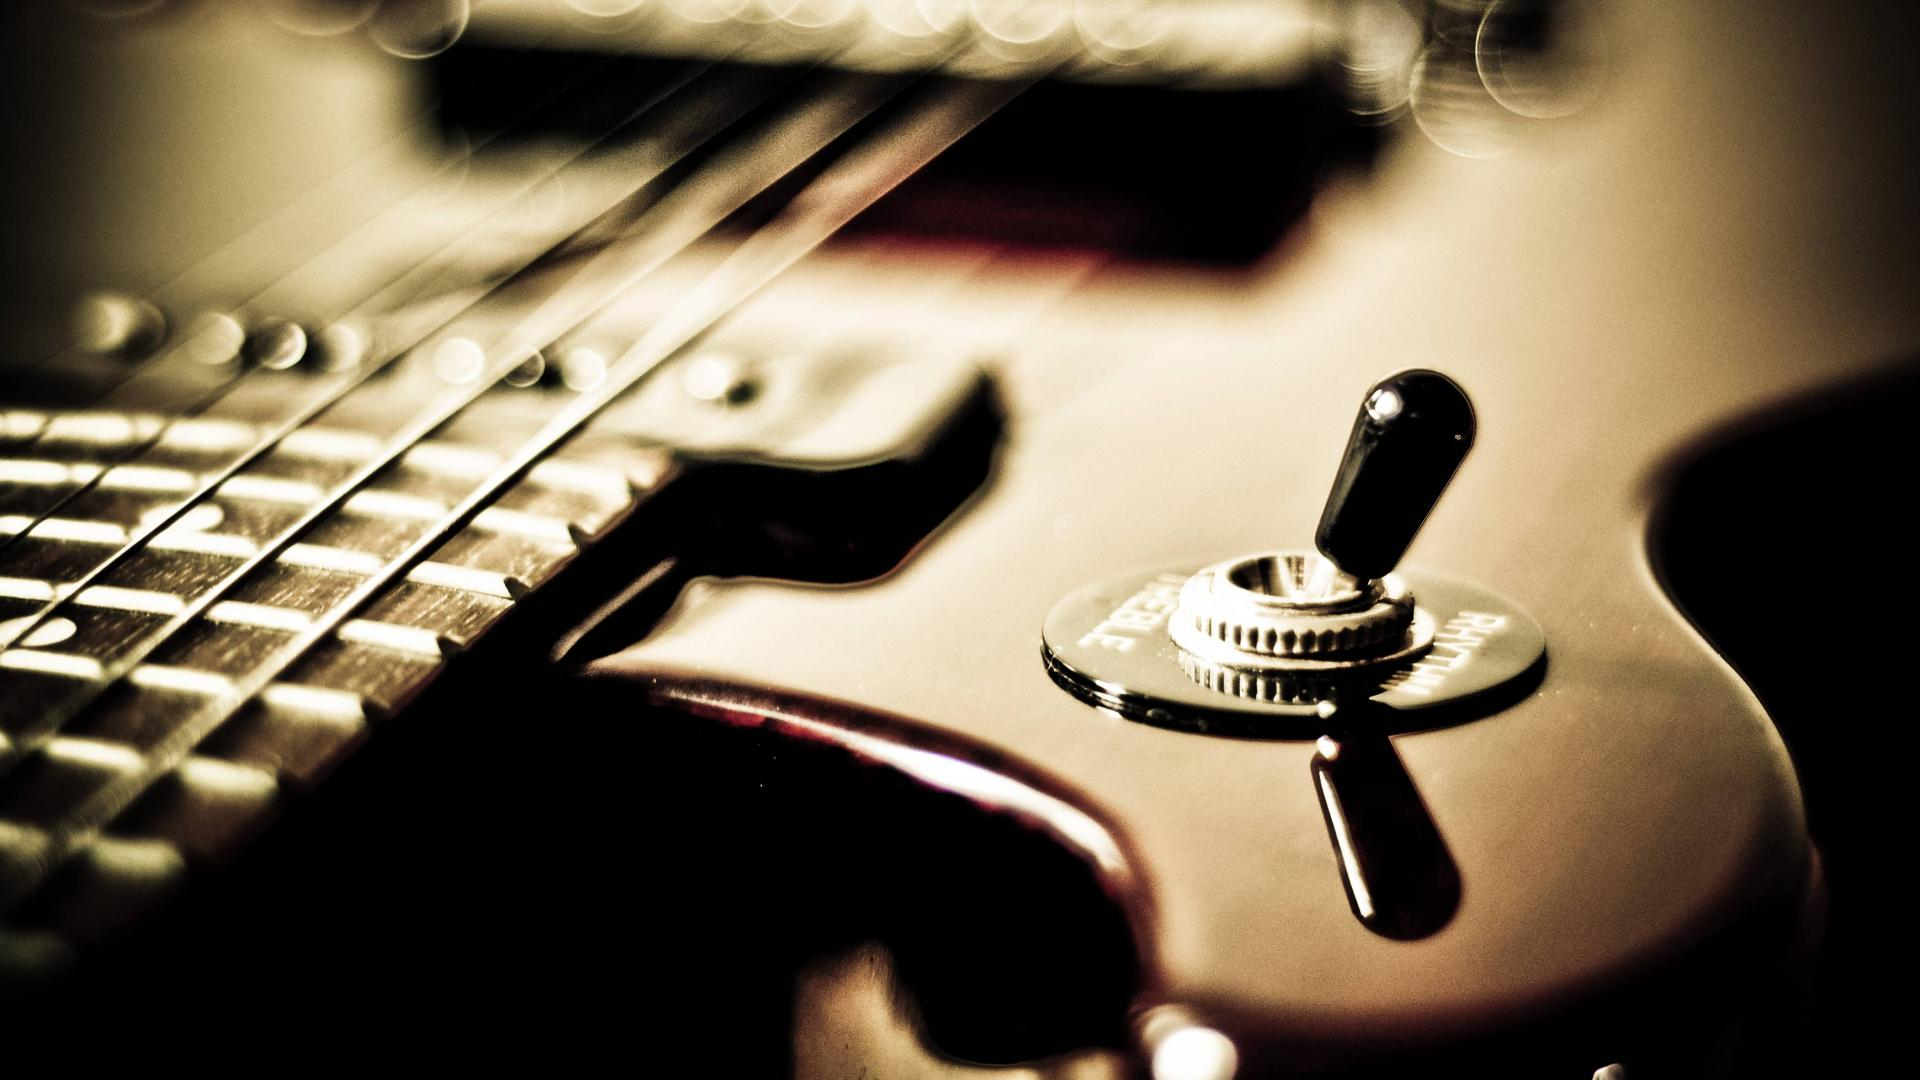 guitar wallpaper widescreen - photo #21